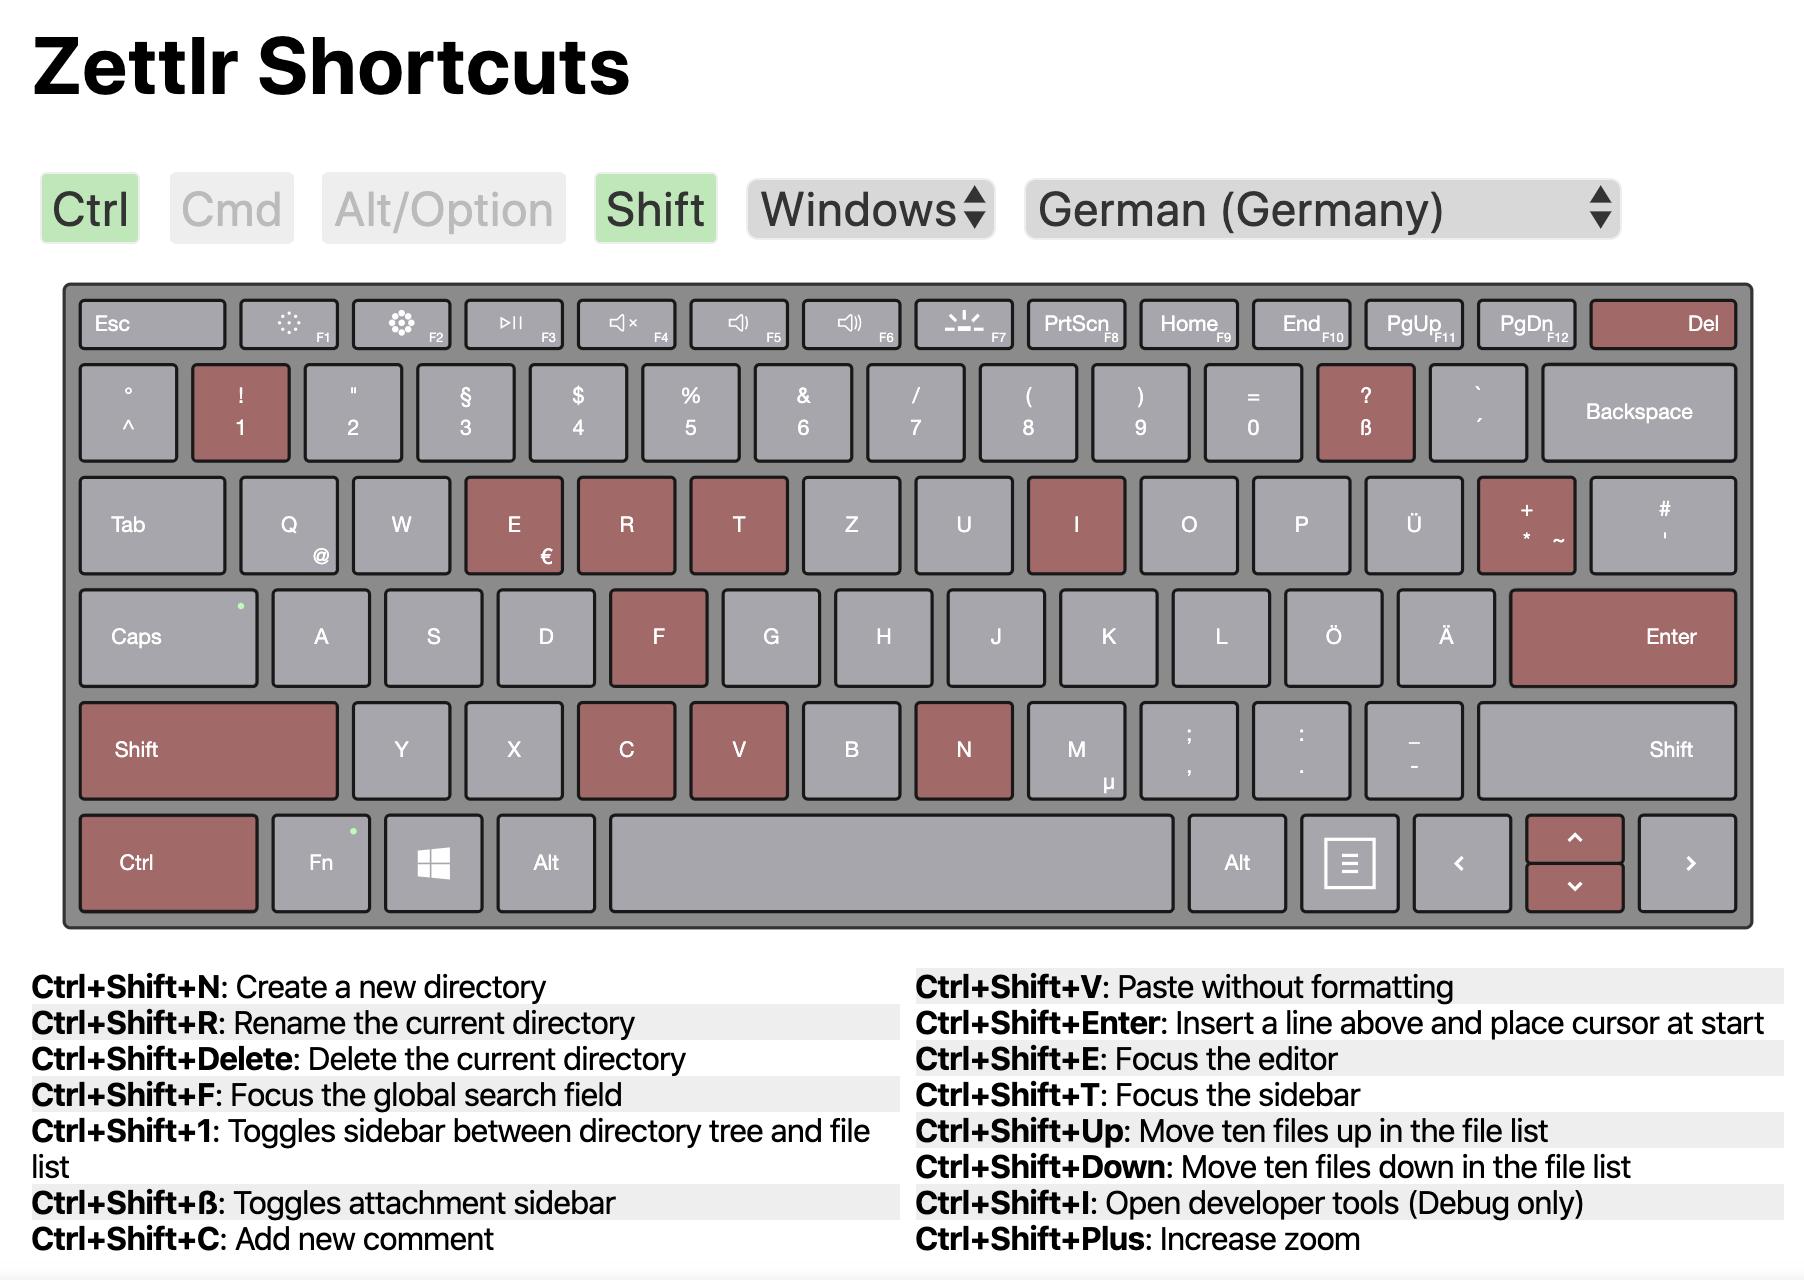 Zettlr Control-Shift Layout